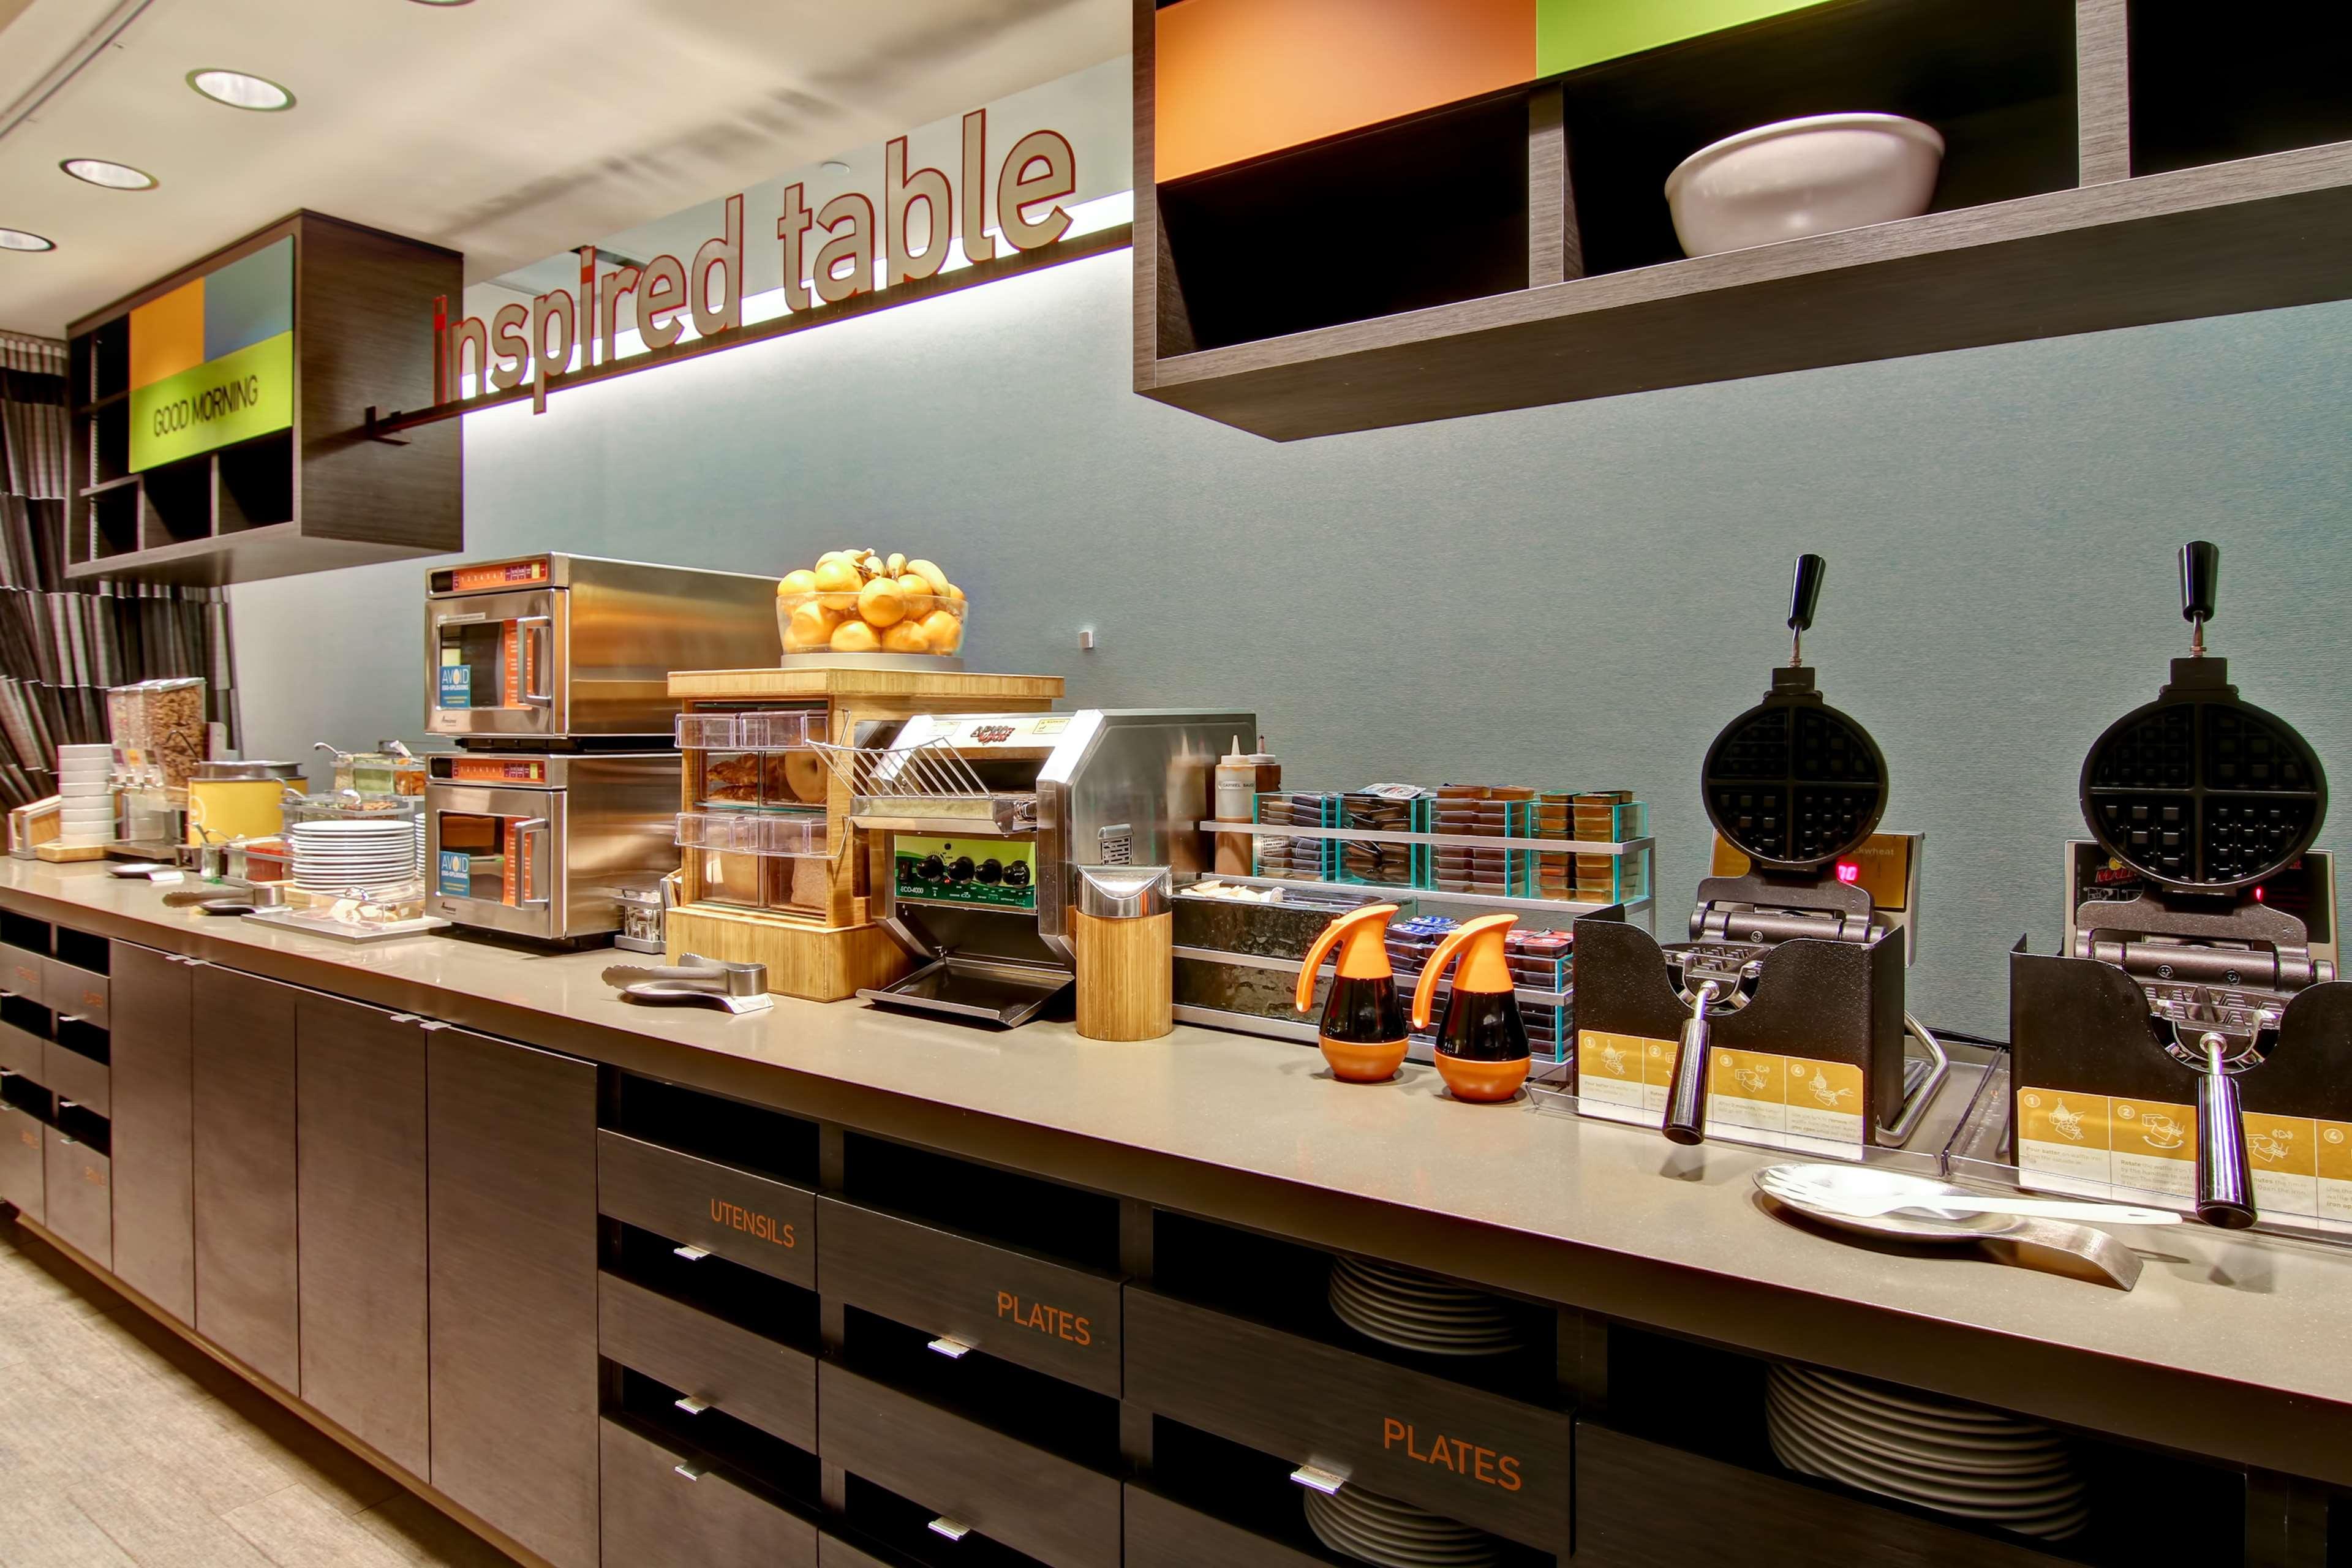 Home2 Suites by Hilton West Edmonton, Alberta, Canada in Edmonton: Restaurant